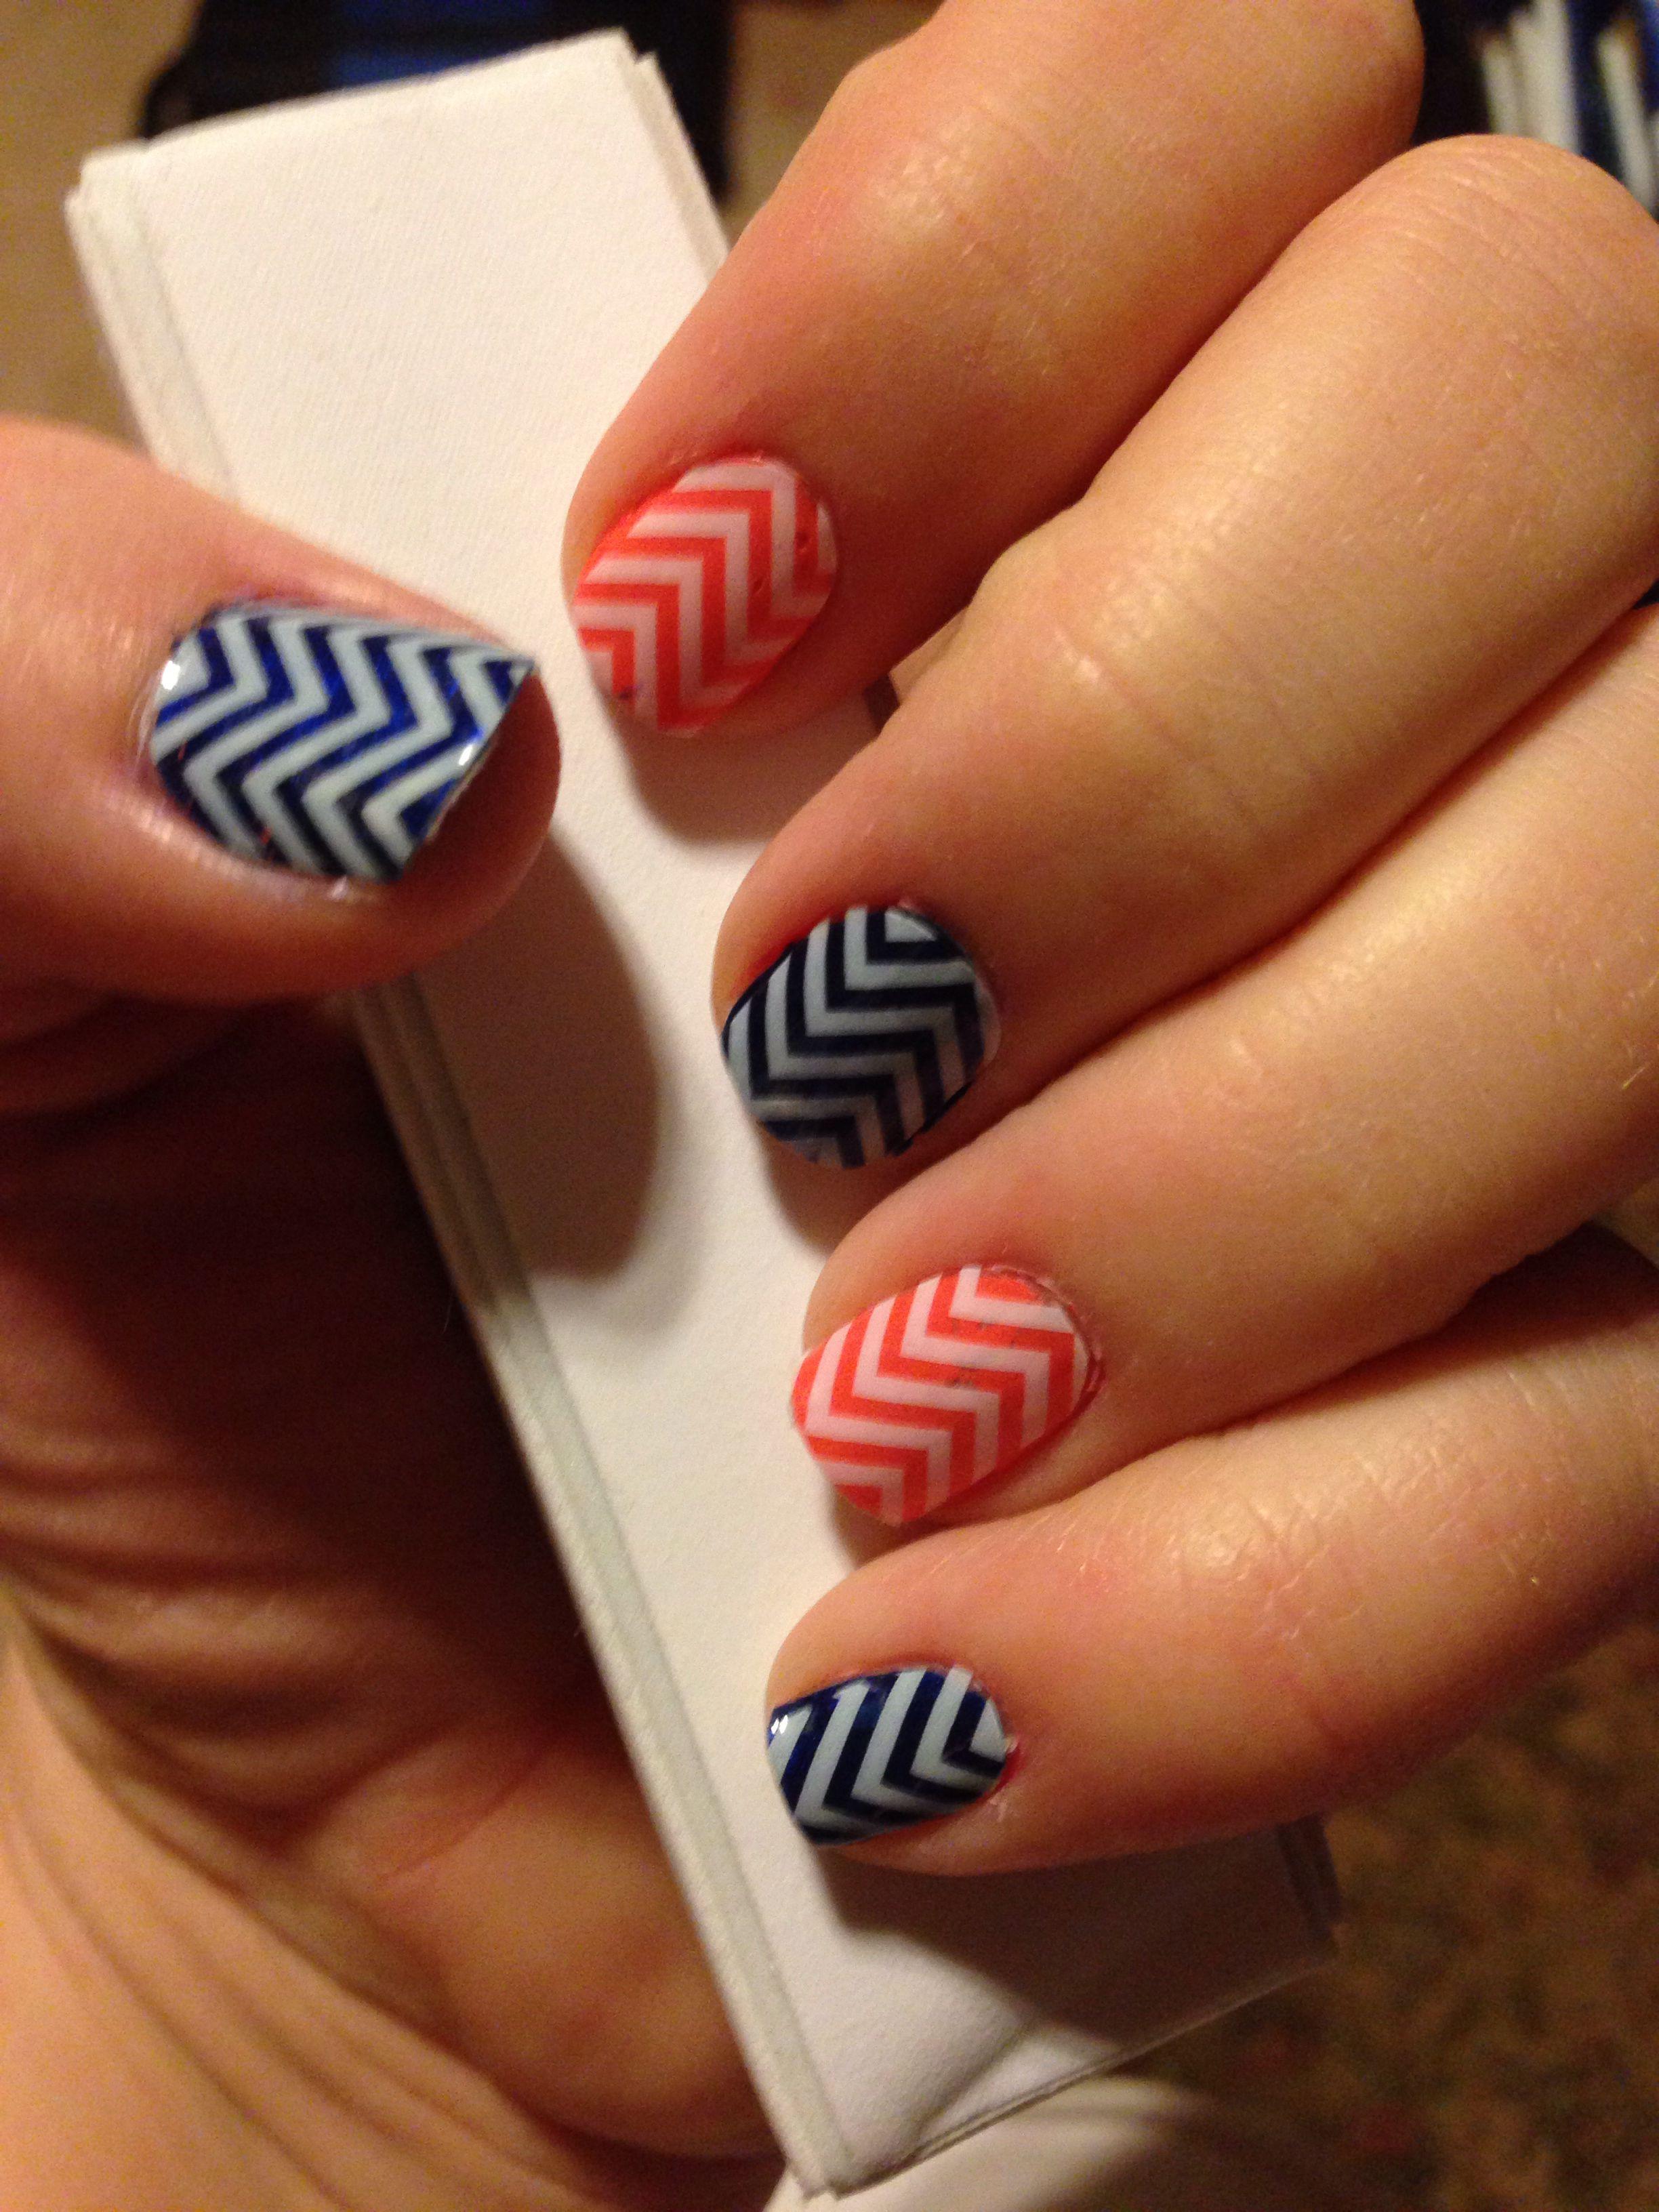 OKC Thunder or Denver Broncos nails! Www.kables.jamberrynails.net ...